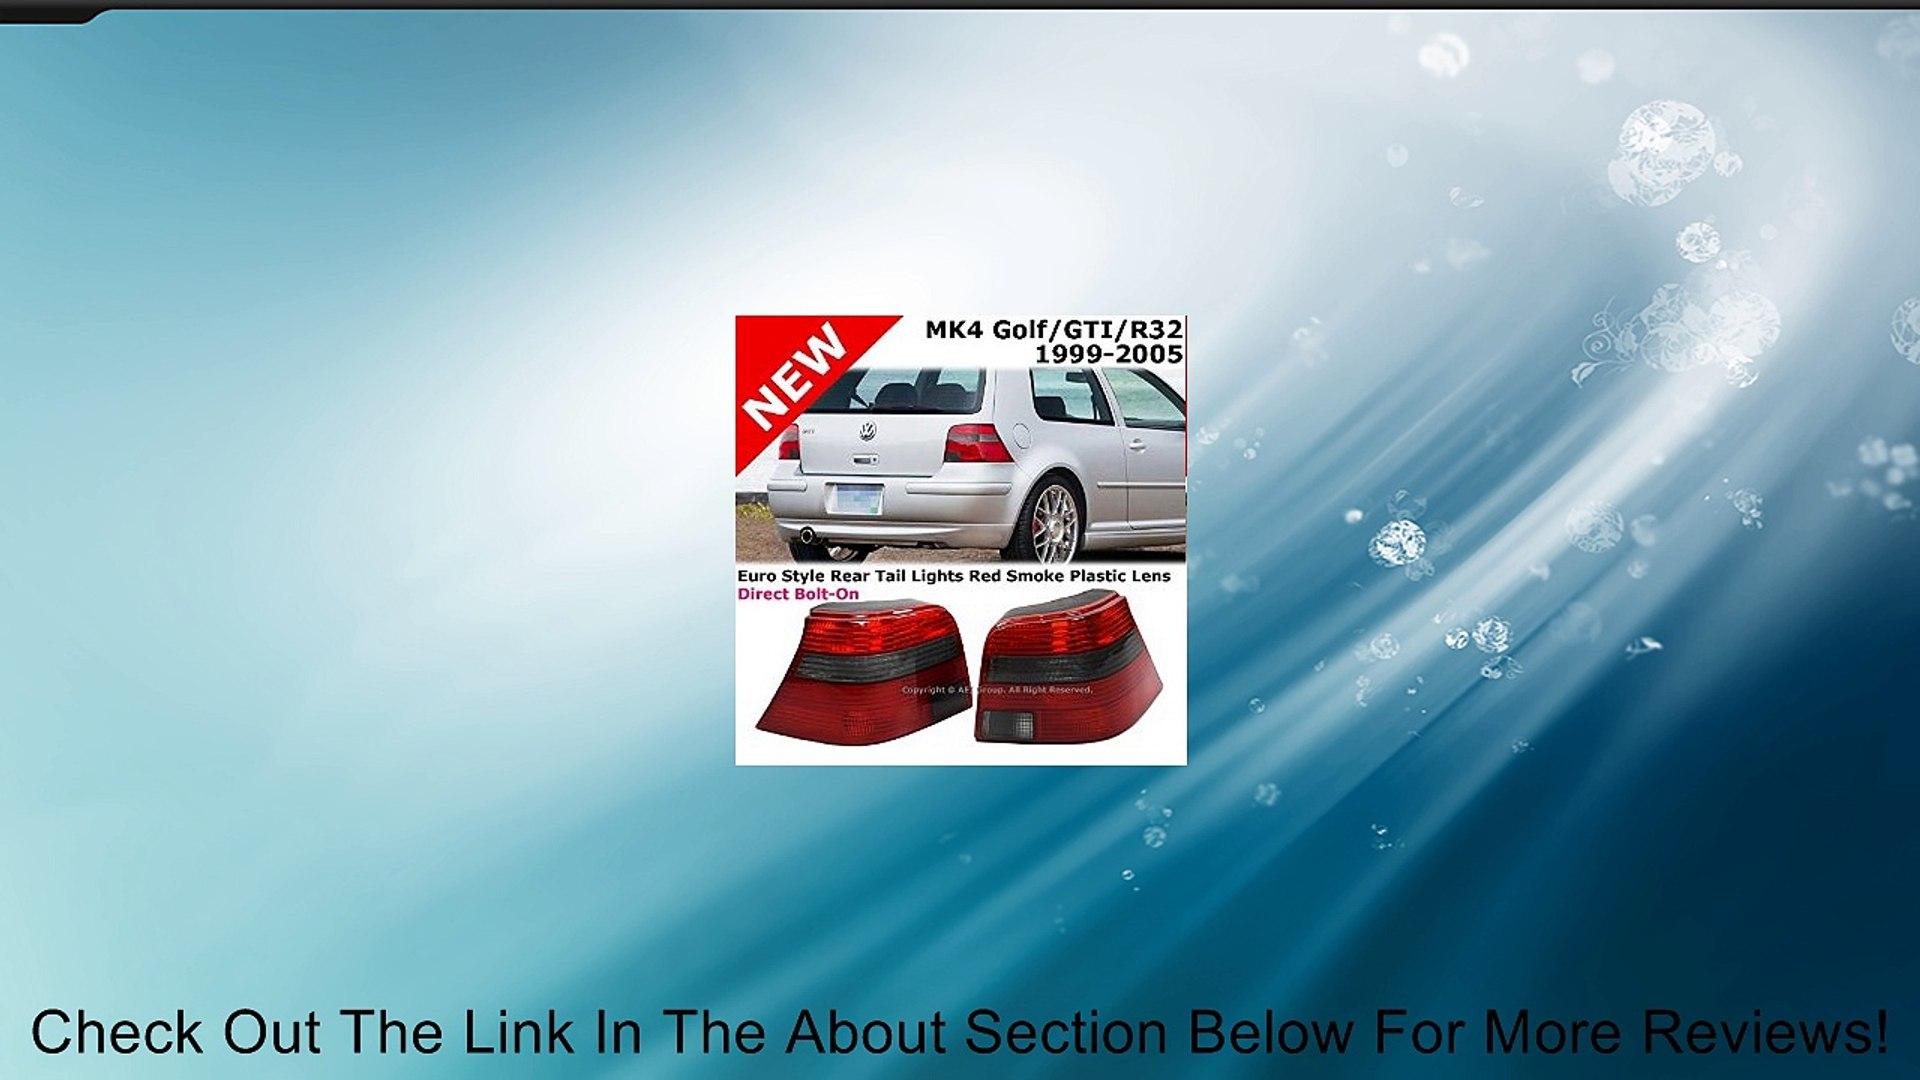 VW Golf MK4 99-05 GTI R32 Euro Style Tail Light Brake Stop Red Smoke Review